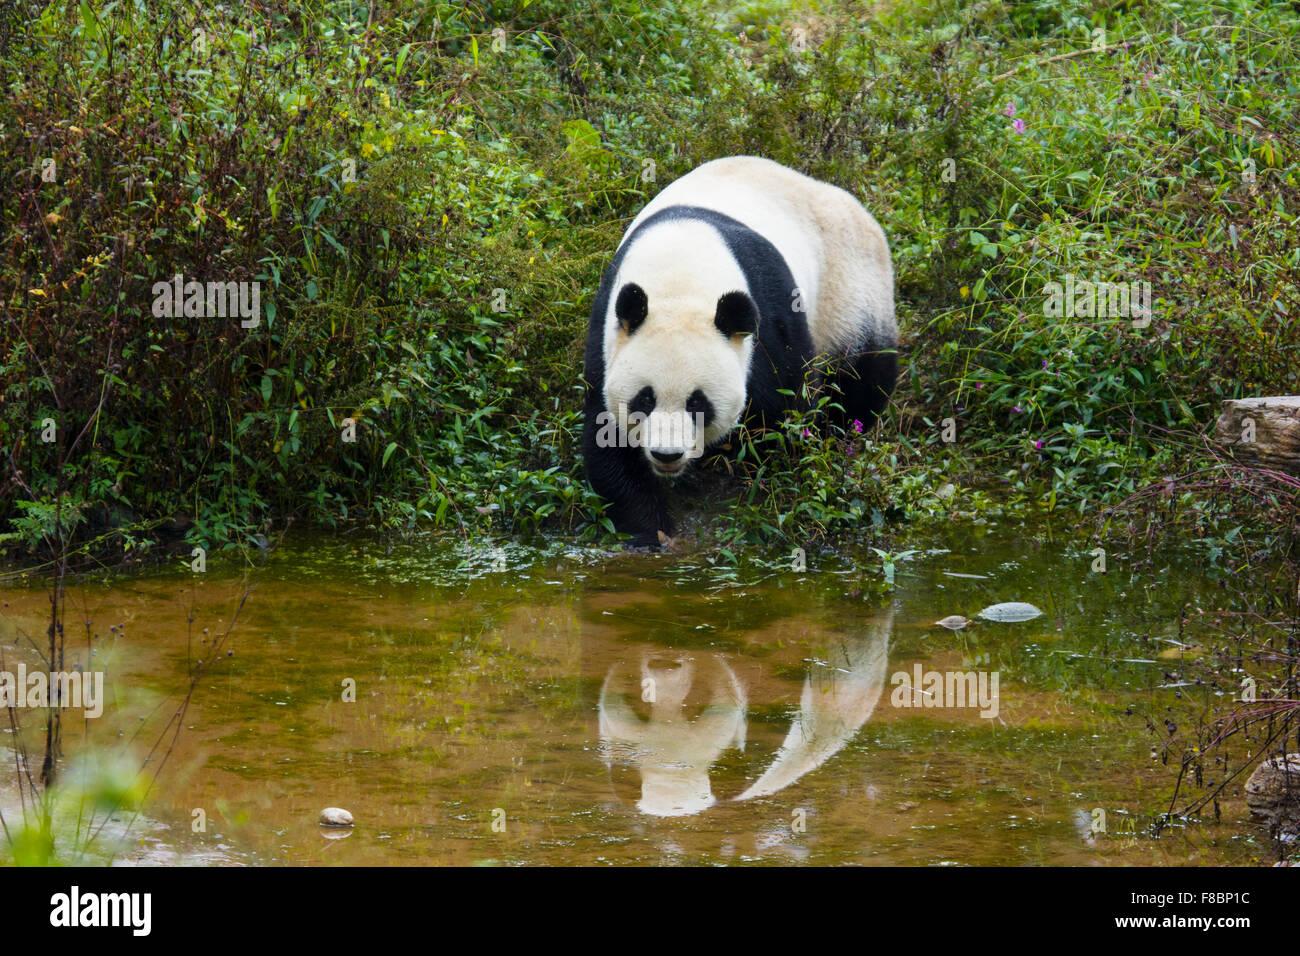 Panda Ailuropoda melanoleuca Bifengxia Panda Base Sichuan Province China MA003066 - Stock Image